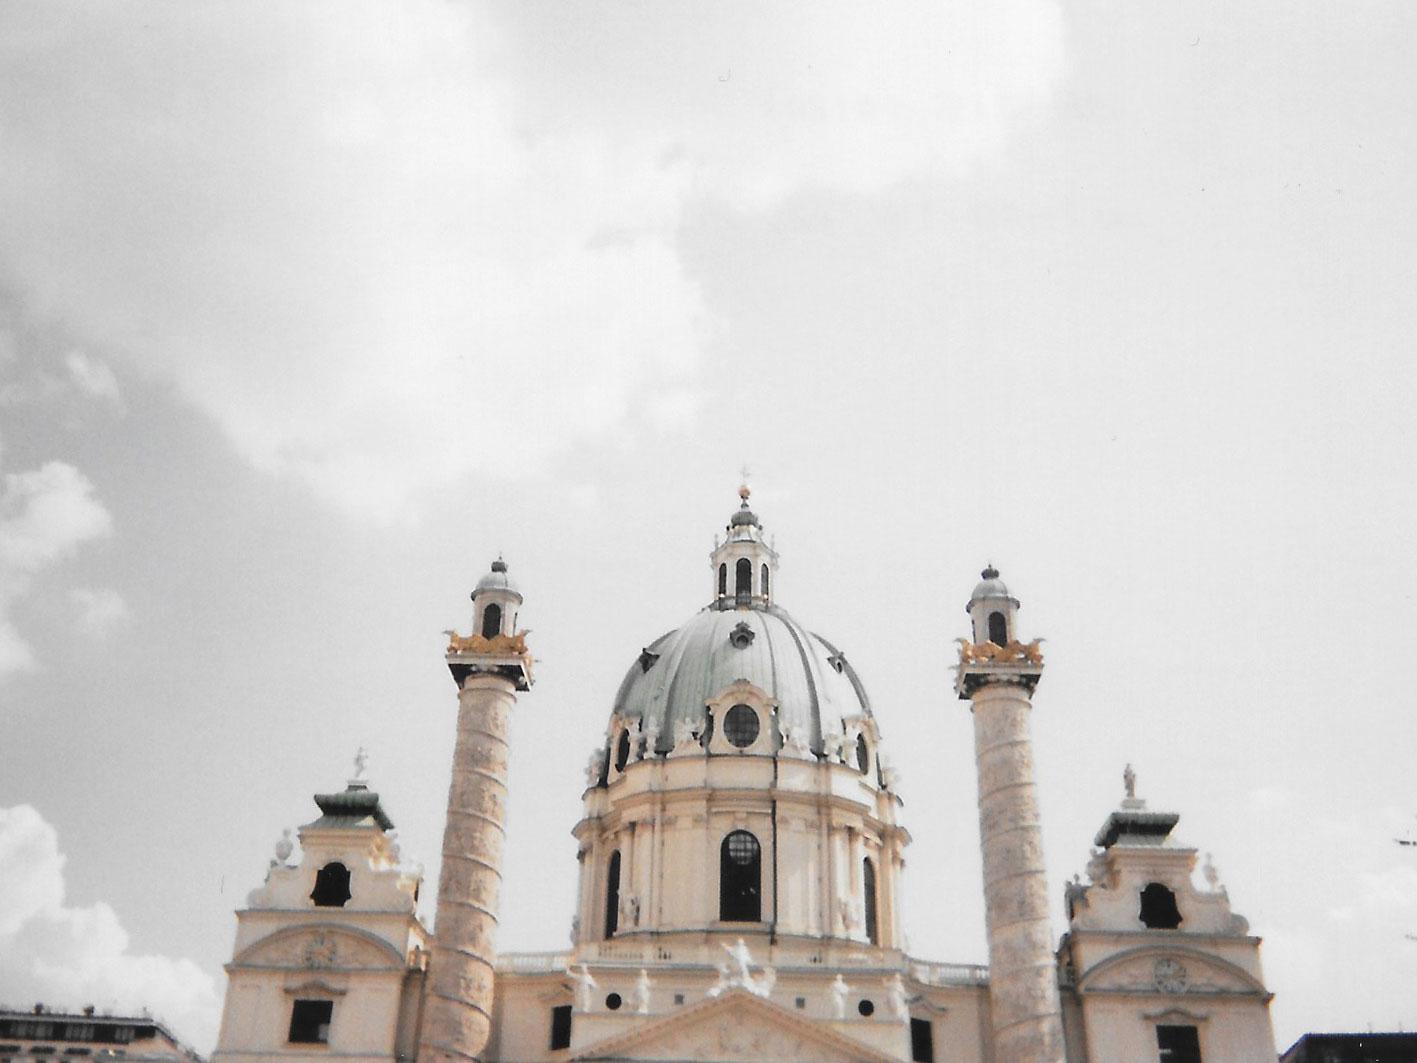 Vienna On Film | Inspiration: Photography